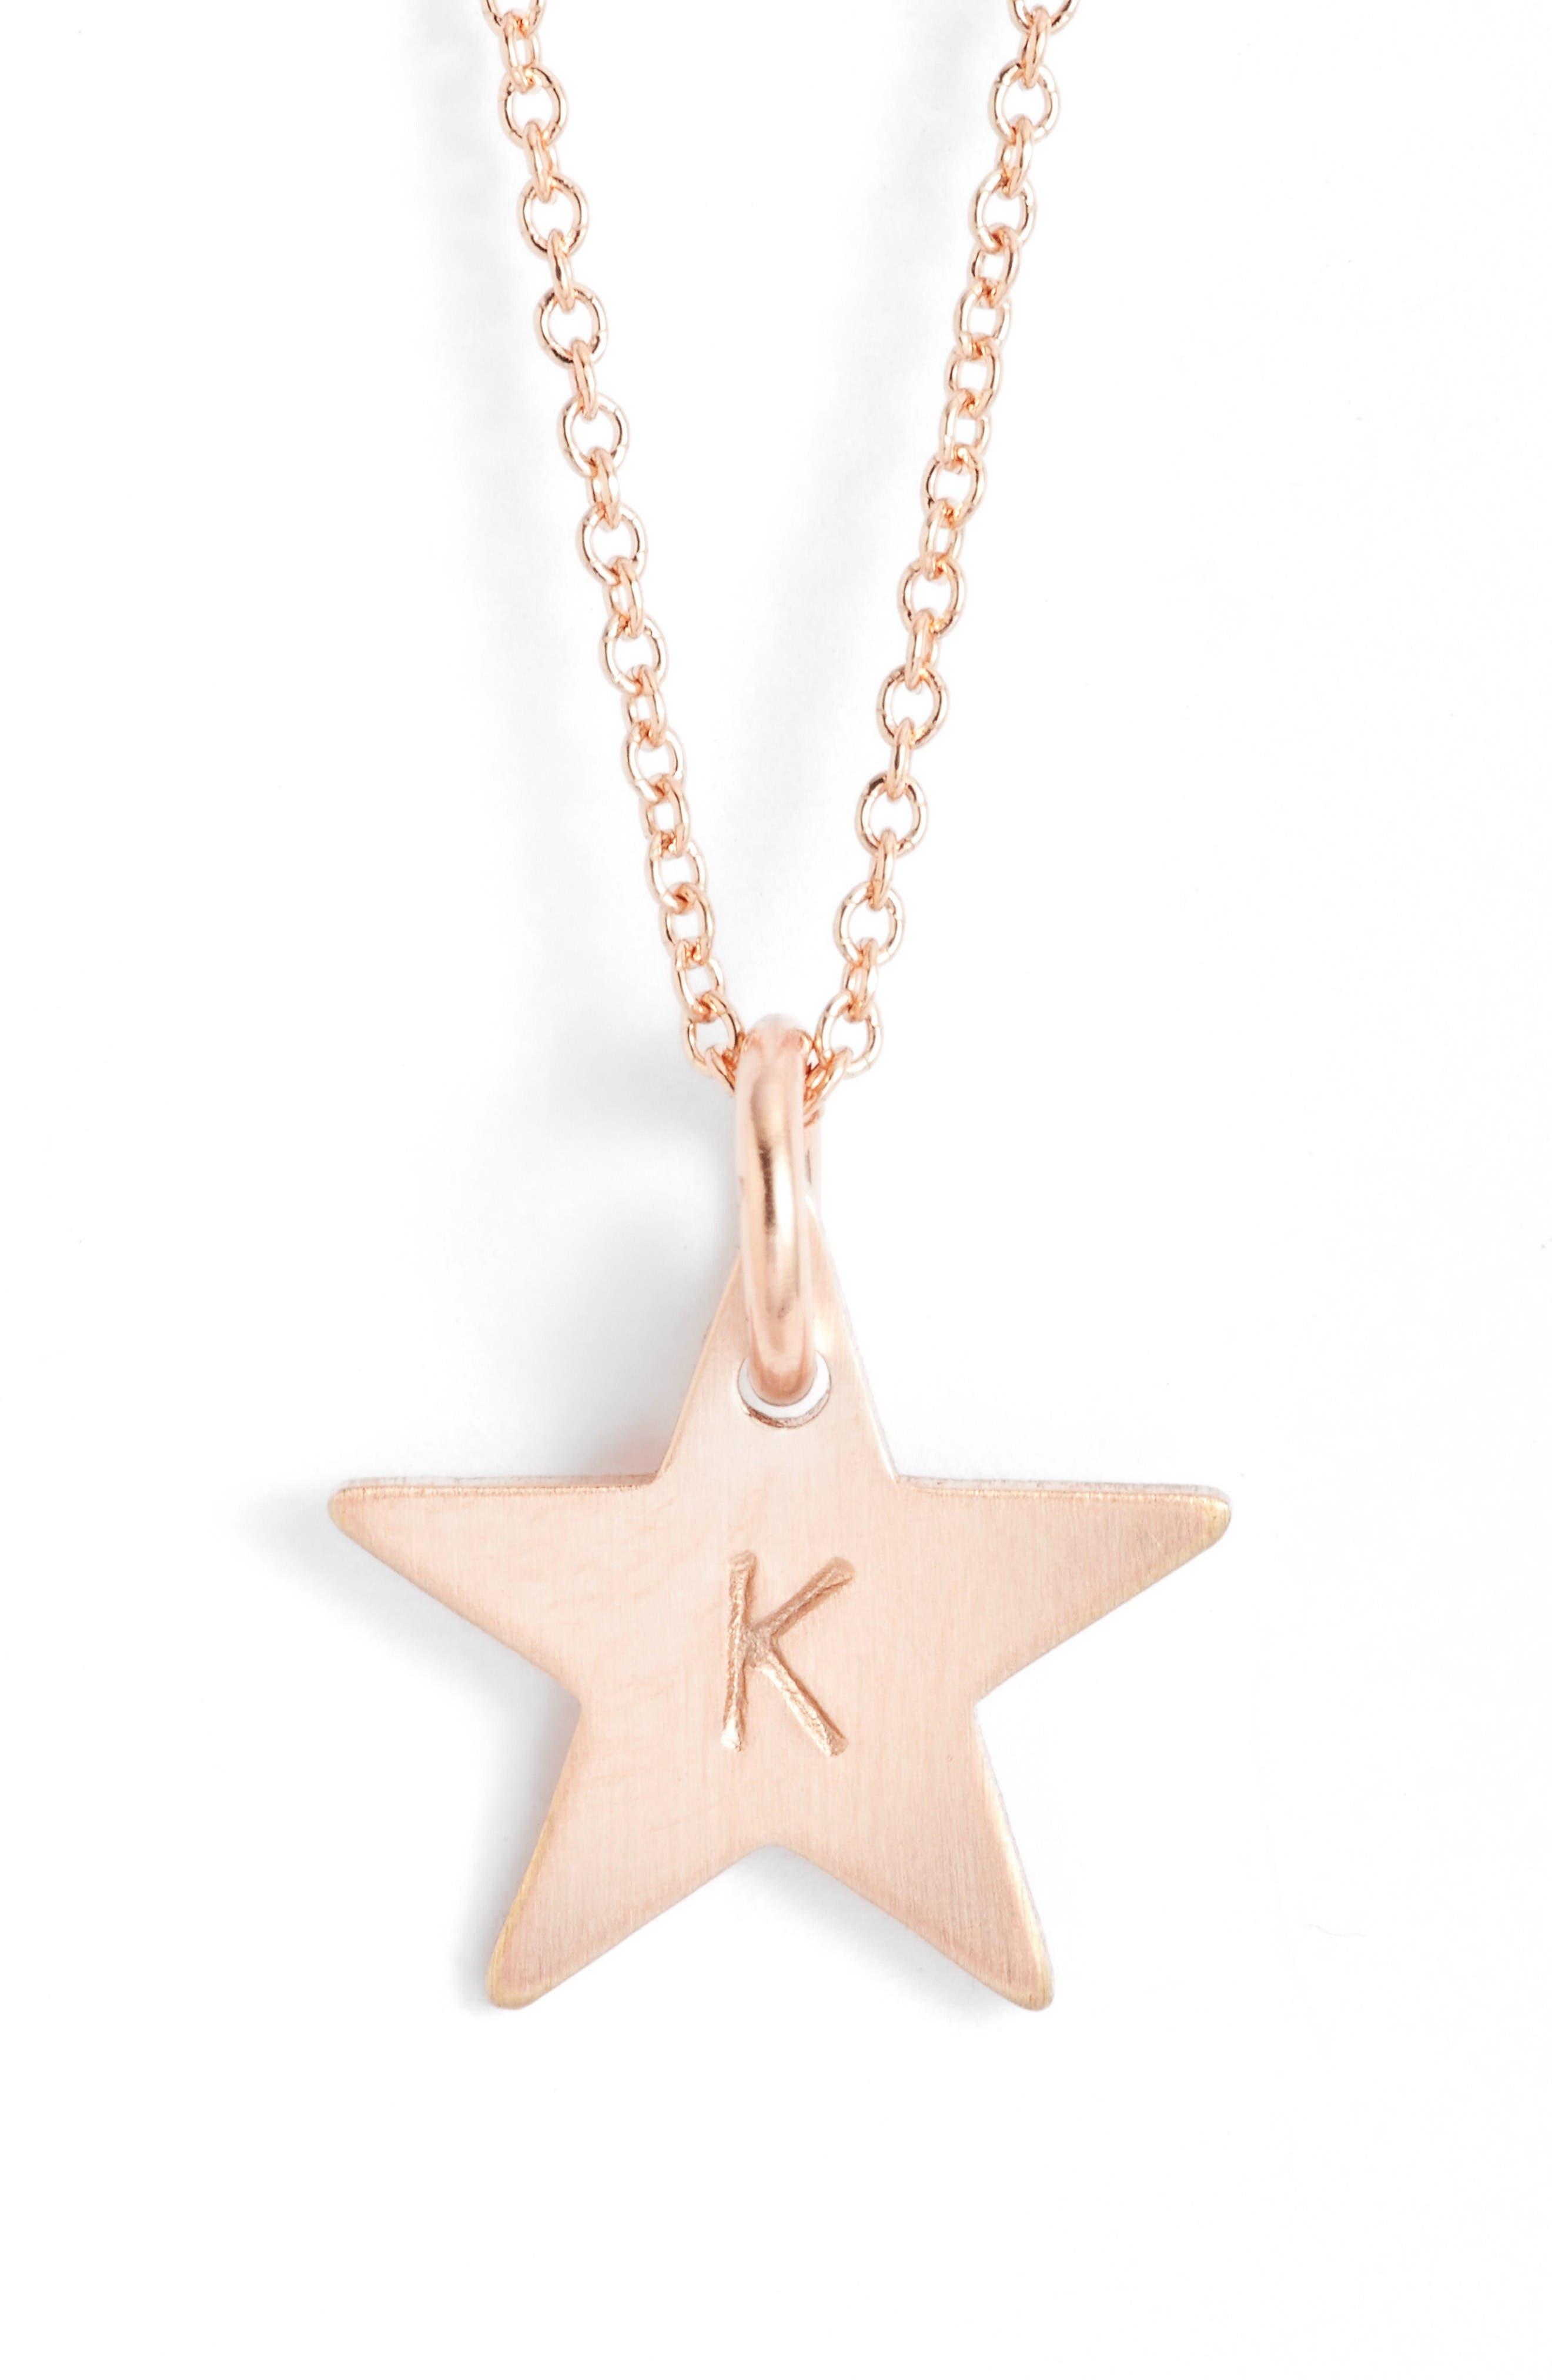 Nashelle 14k-Rose Gold Fill Initial Mini Star Pendant Necklace